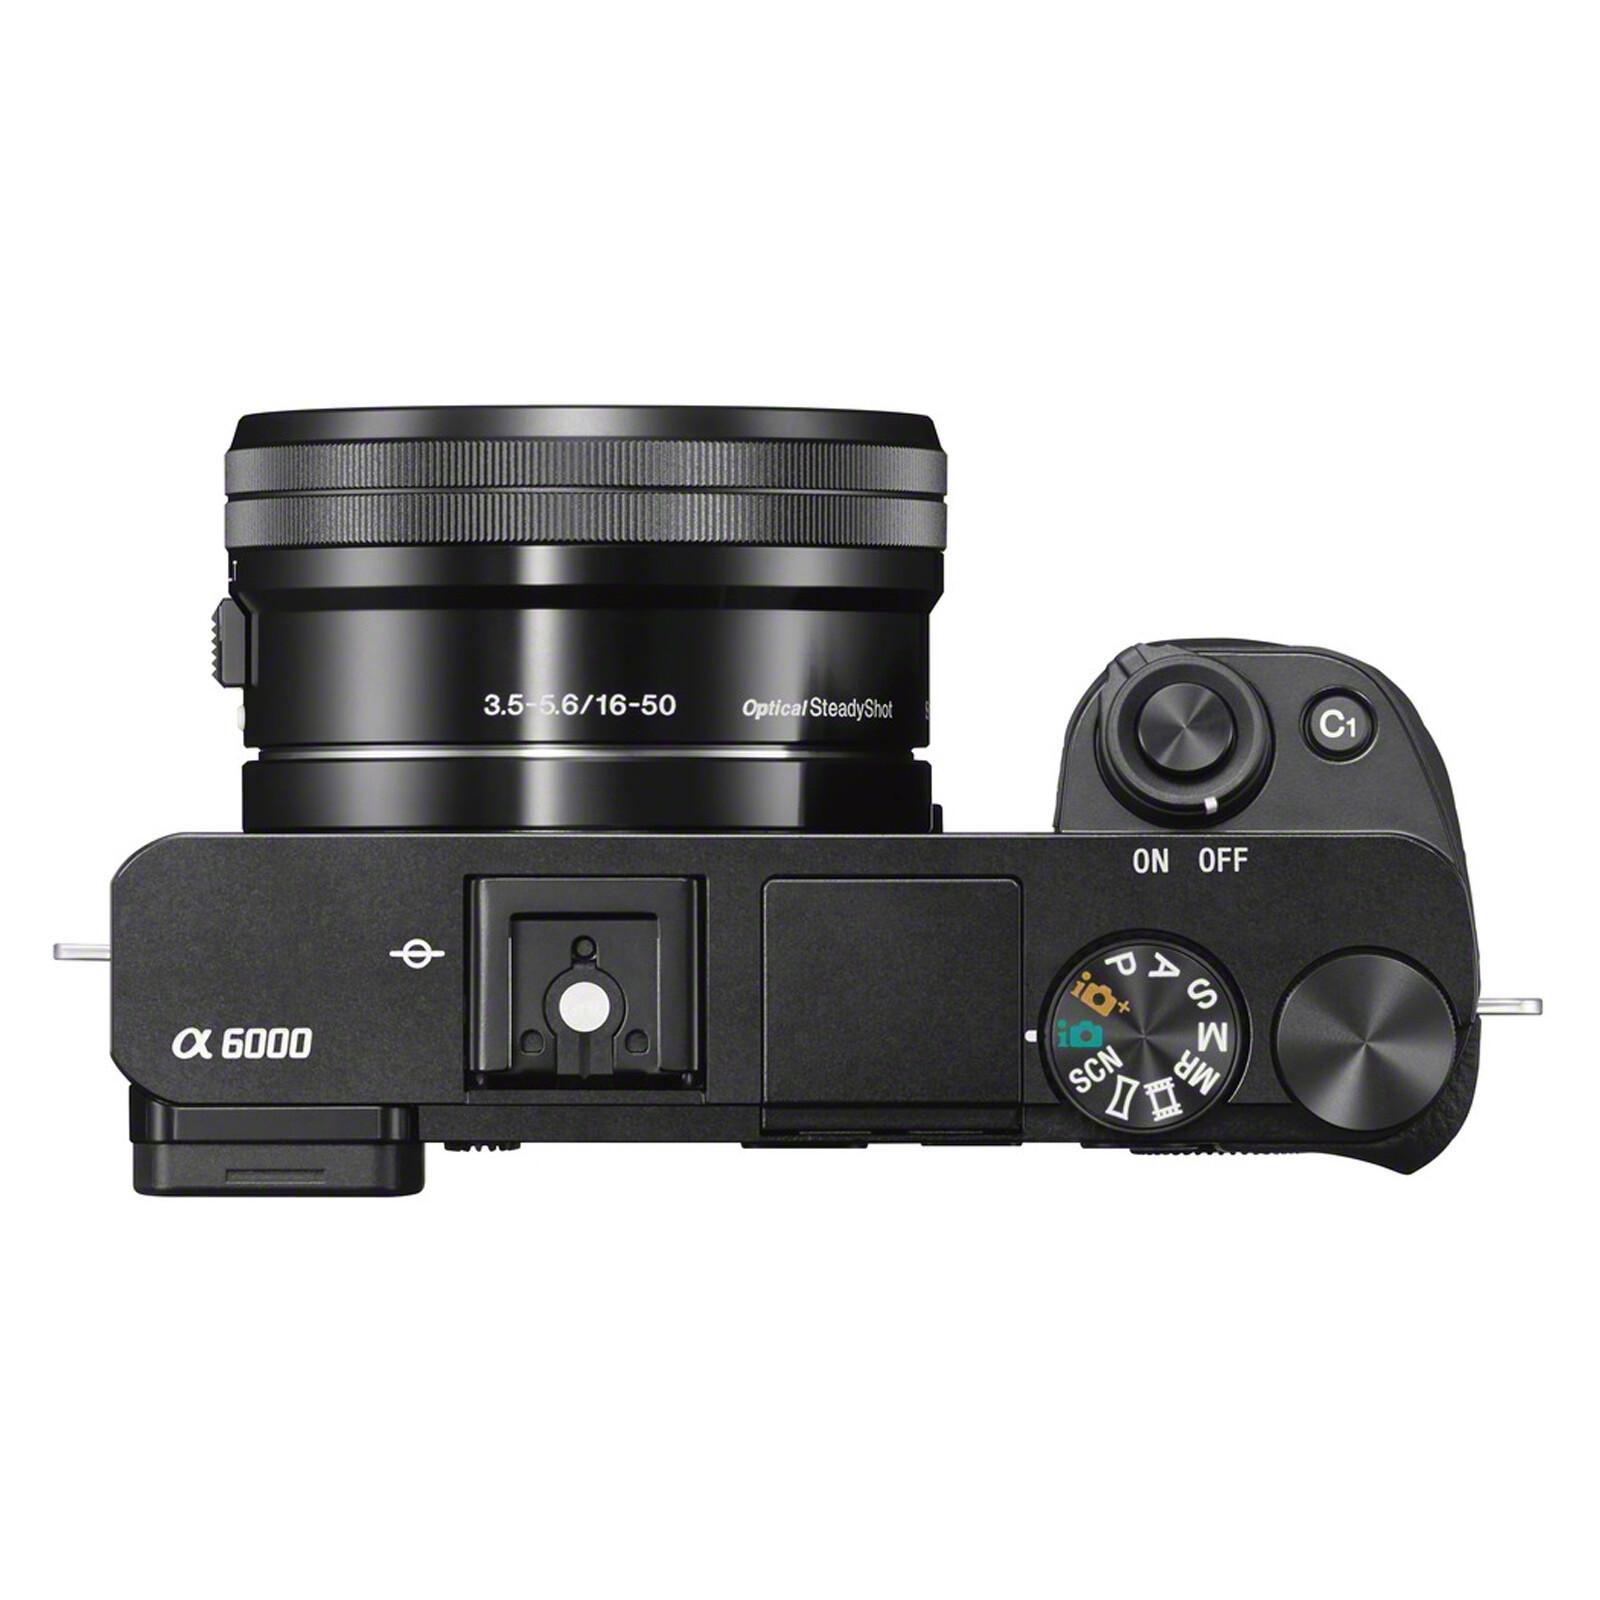 Sony ALPHA 6000 + SELP 16-50/3,5-5,6 OSS PZ Schwarz